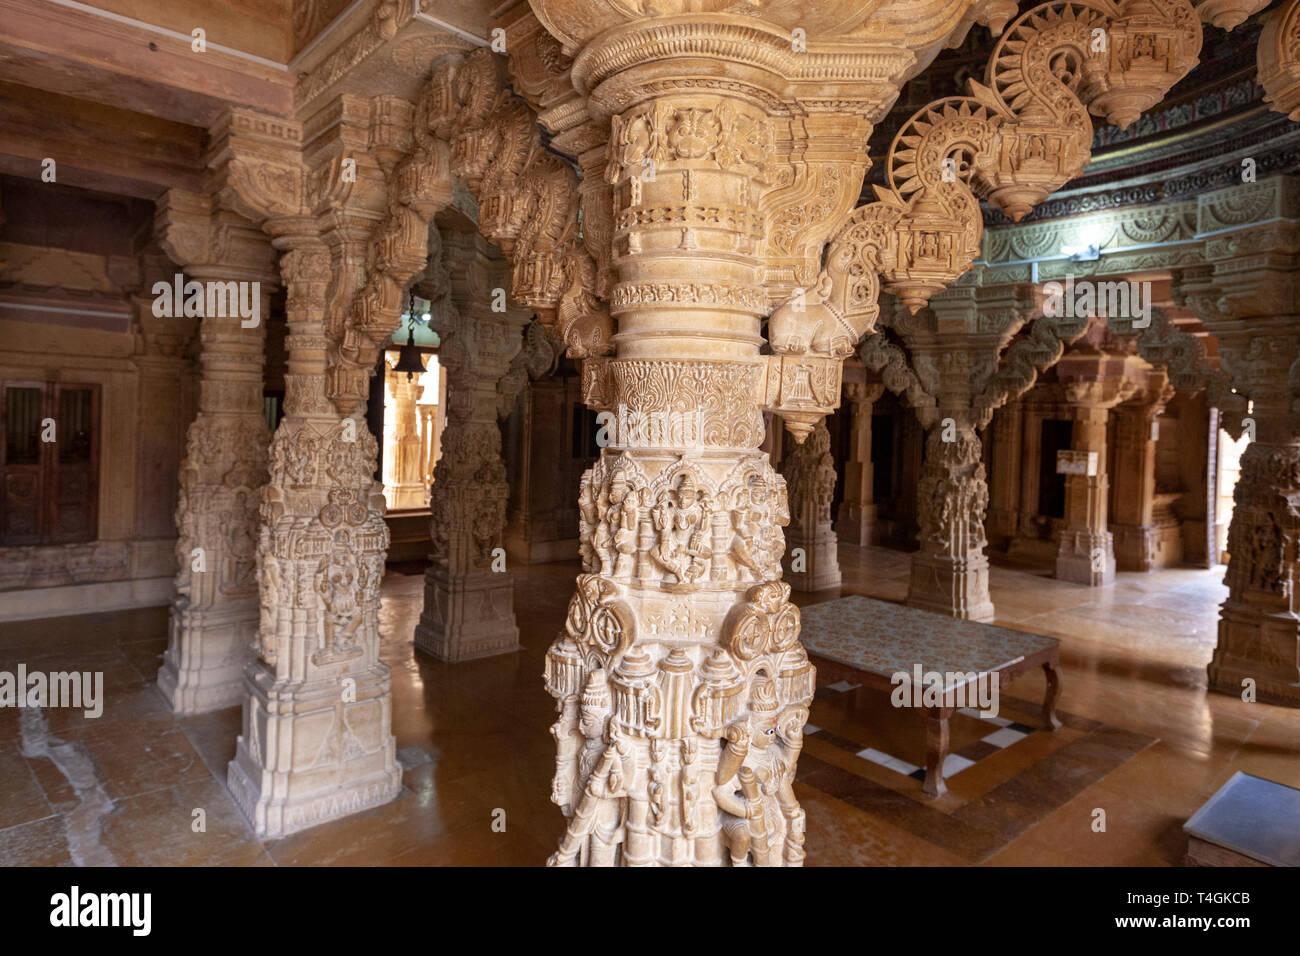 Chandraprabhu Jain Temple  jaisalmer, Rajasthan, India - Stock Image